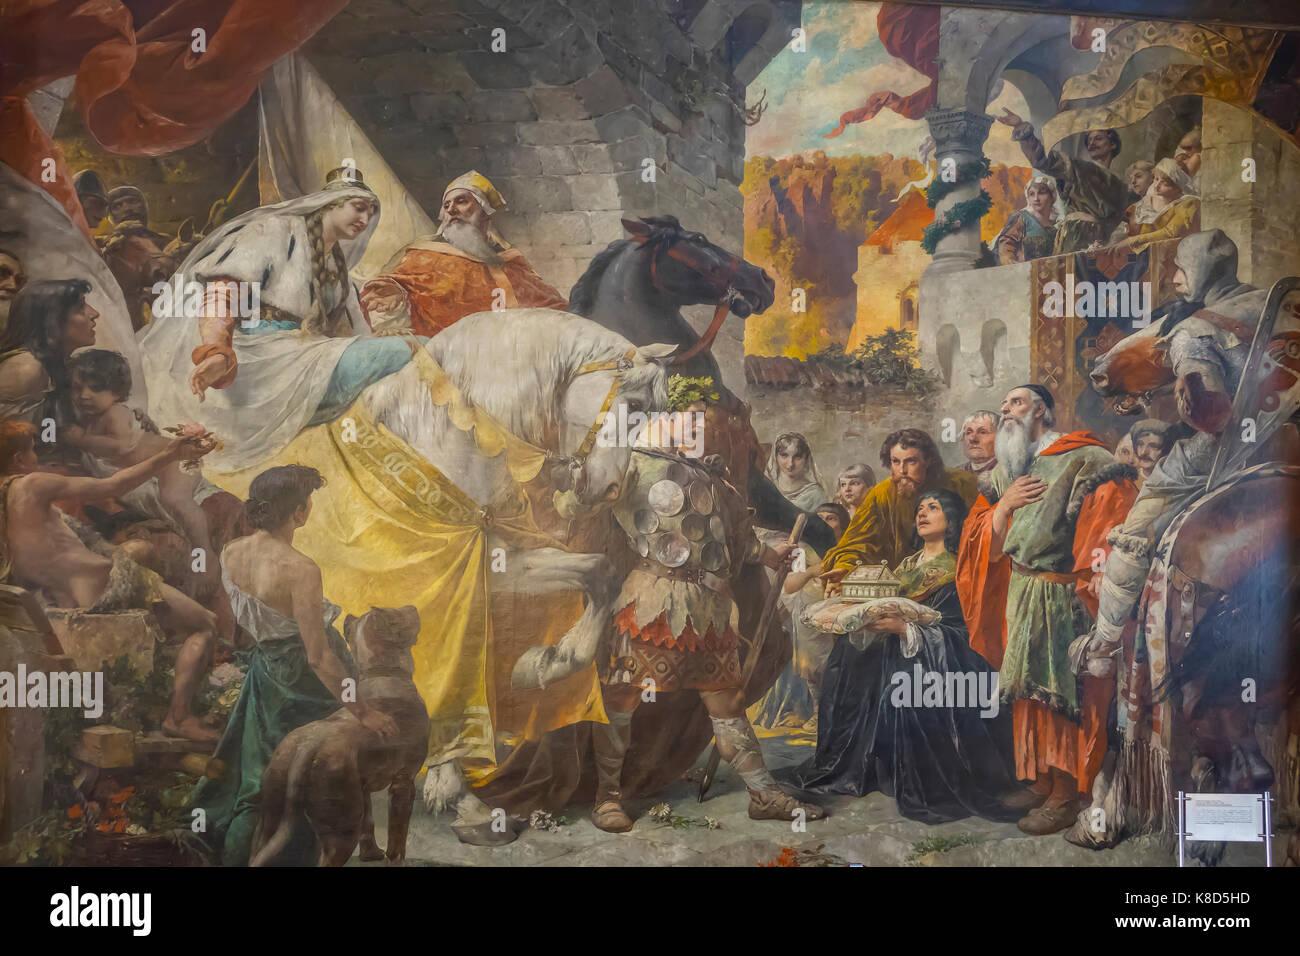 Germany, Lower Bavaria, Passau, Rathaus interior, Nibelungs Saga painting in hall - Stock Image